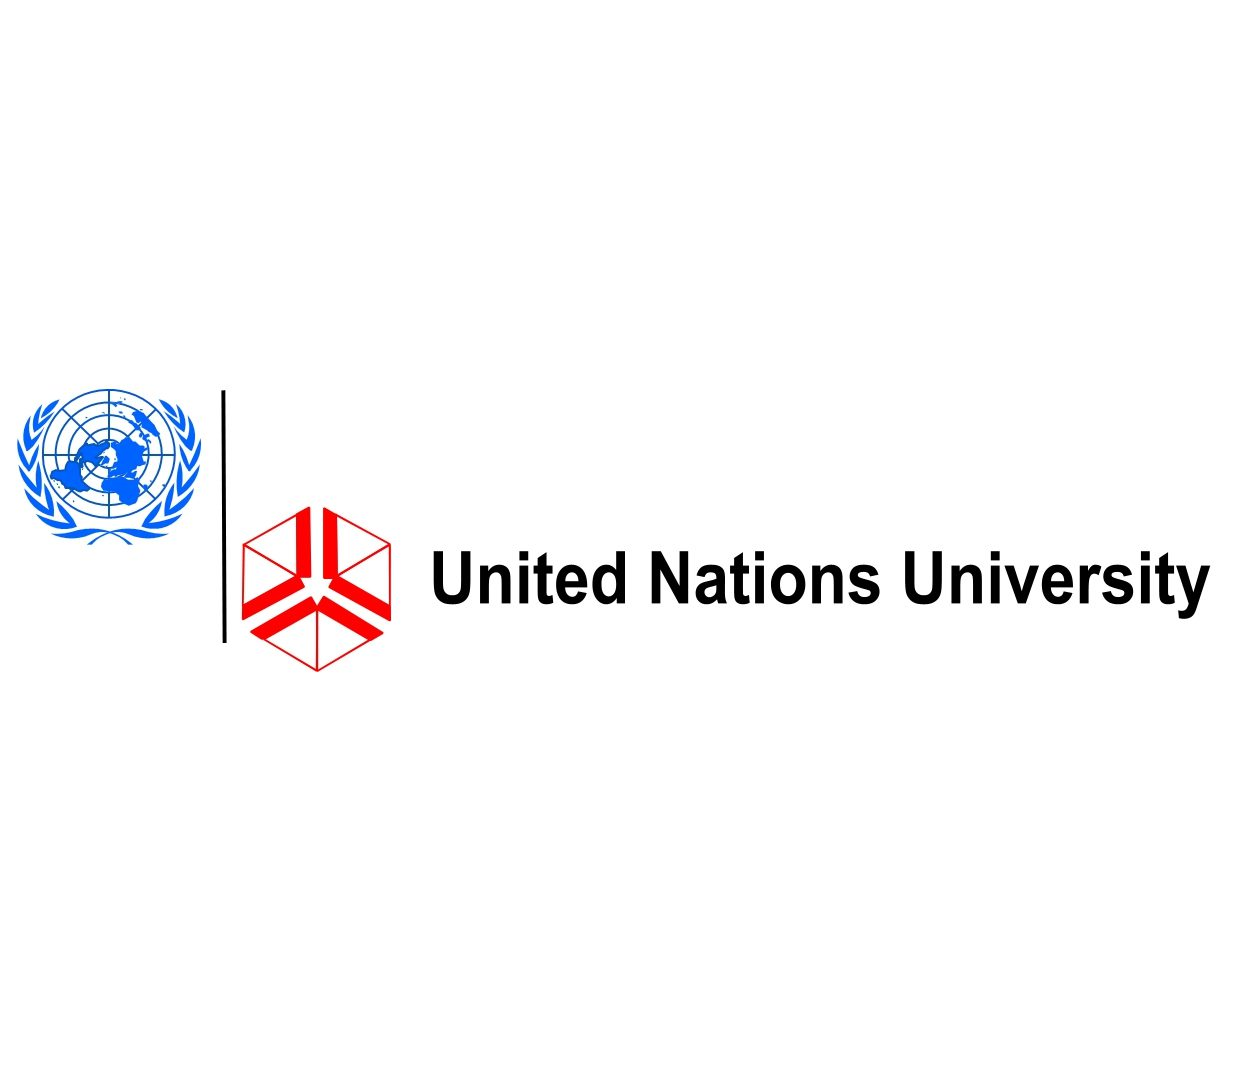 2015 Junior Fellows Internship Programme at United Nations